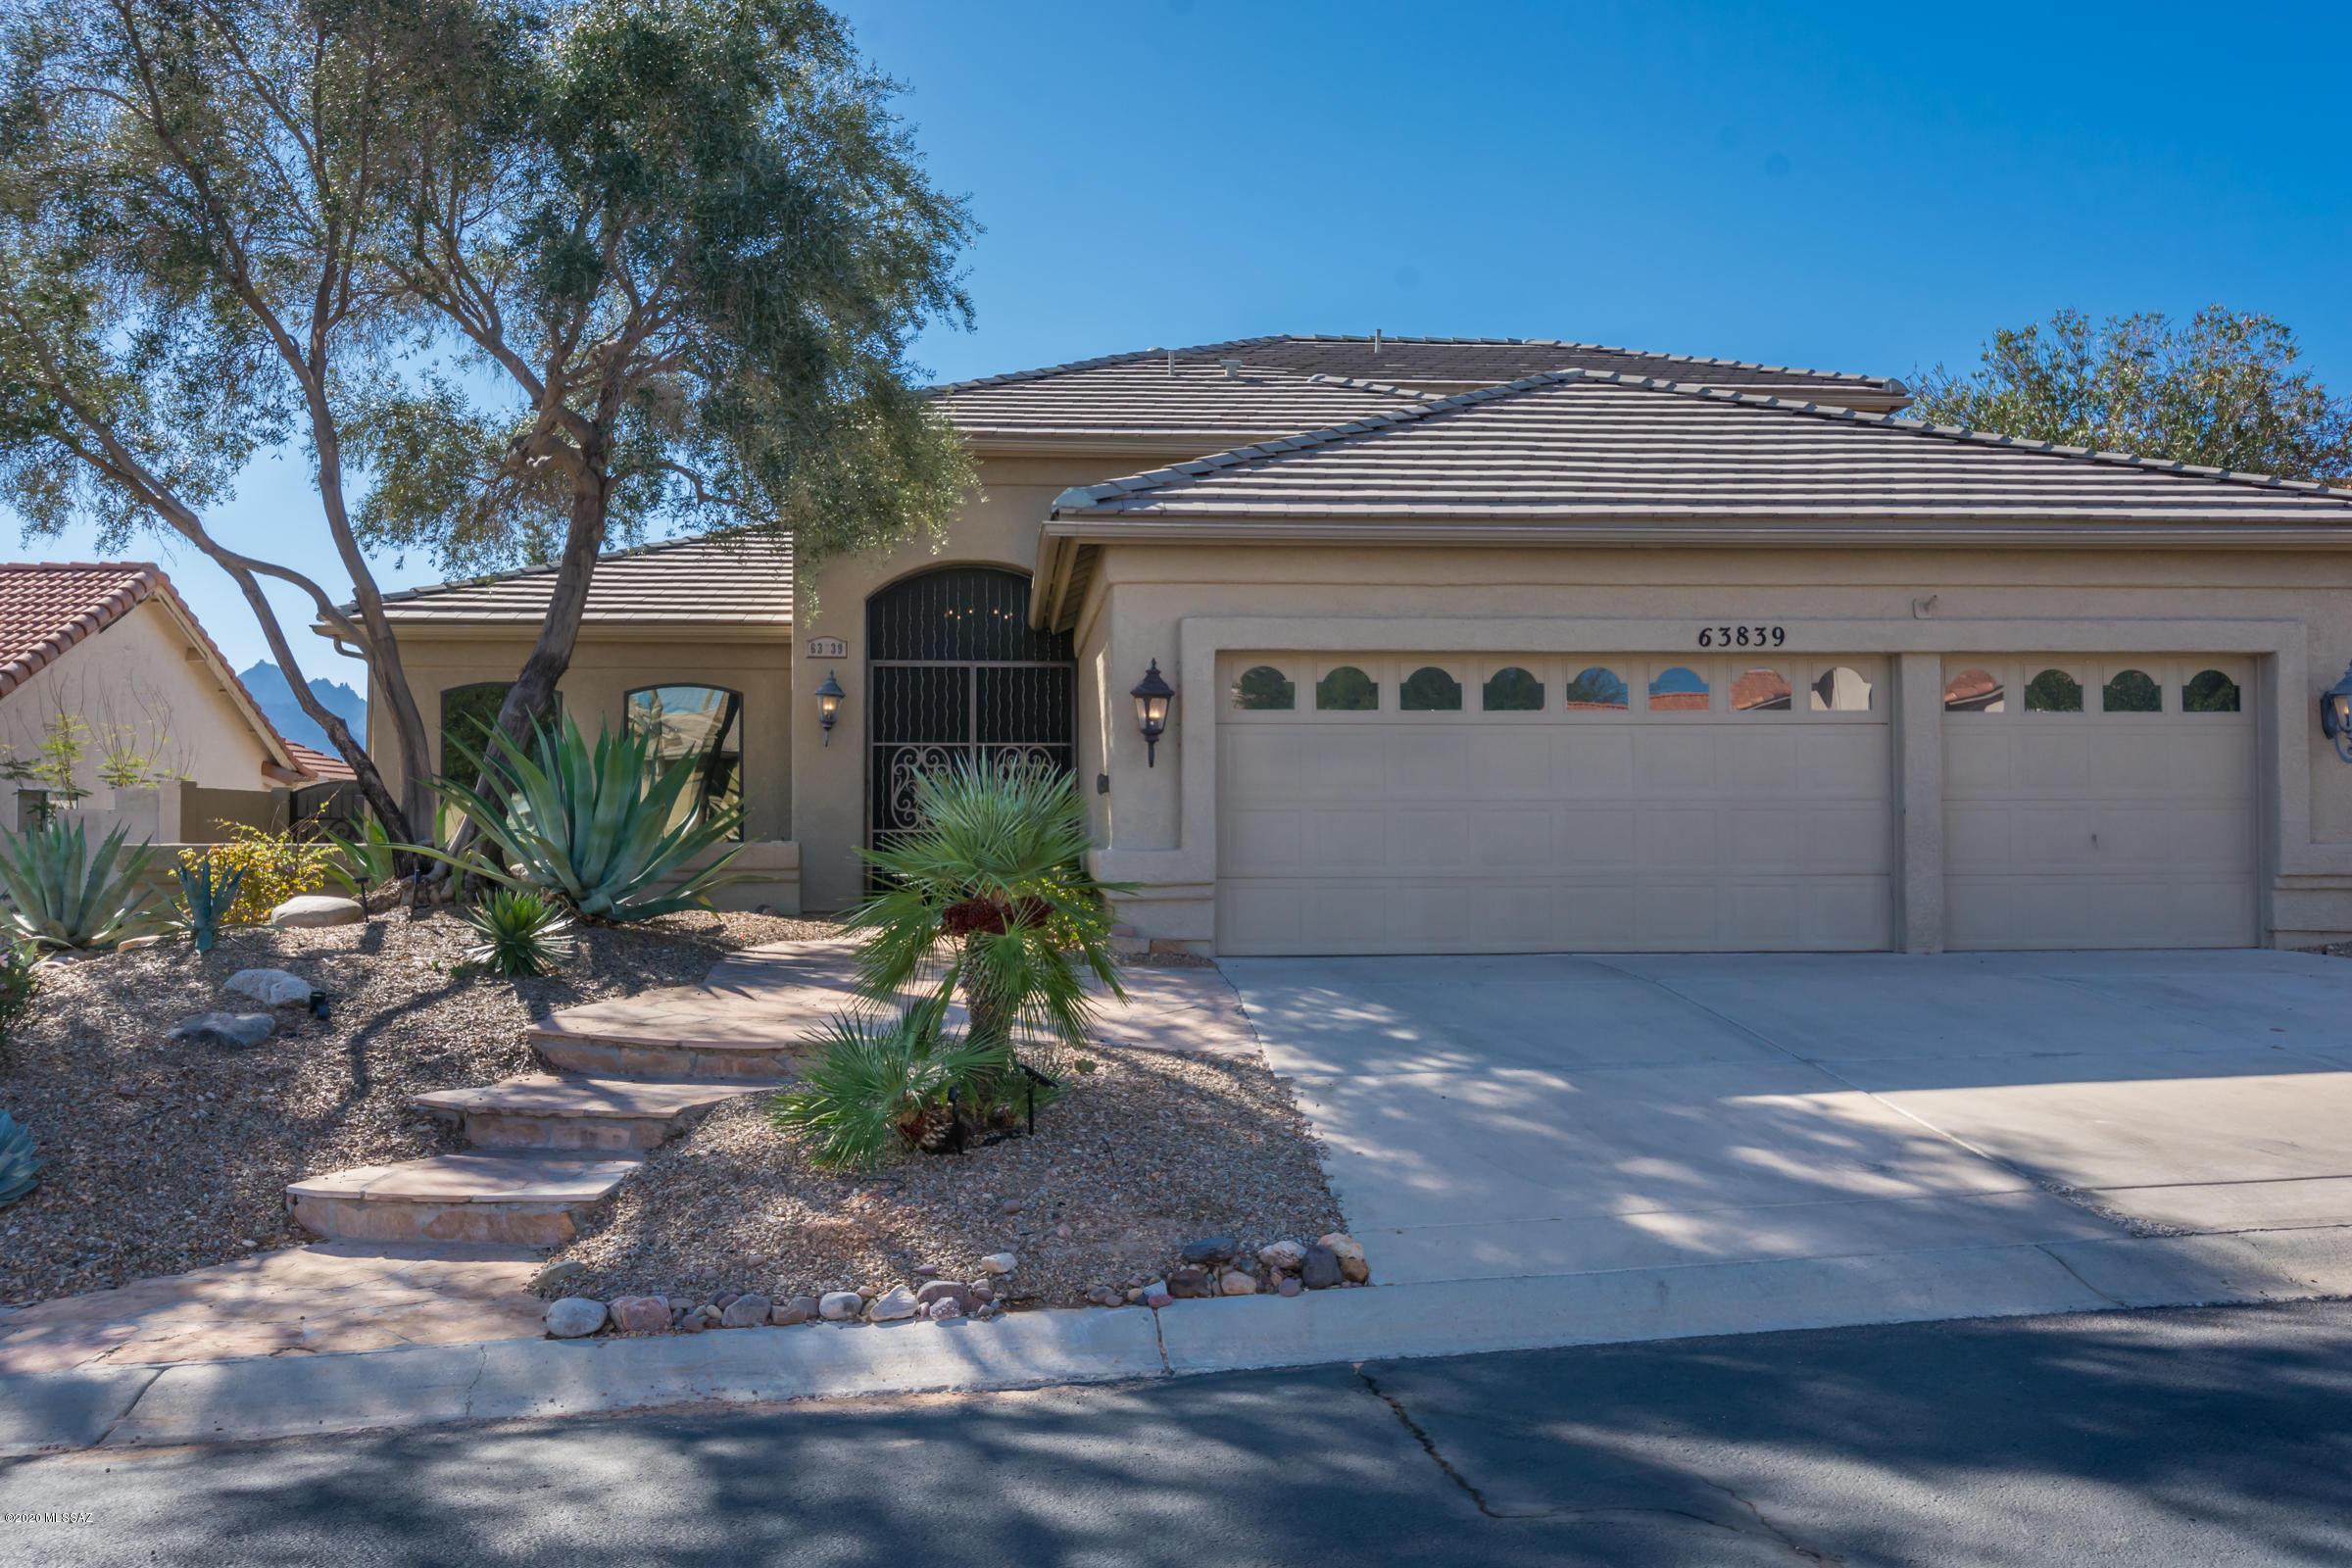 Photo of 63839 E Orangewood Lane, Tucson, AZ 85739